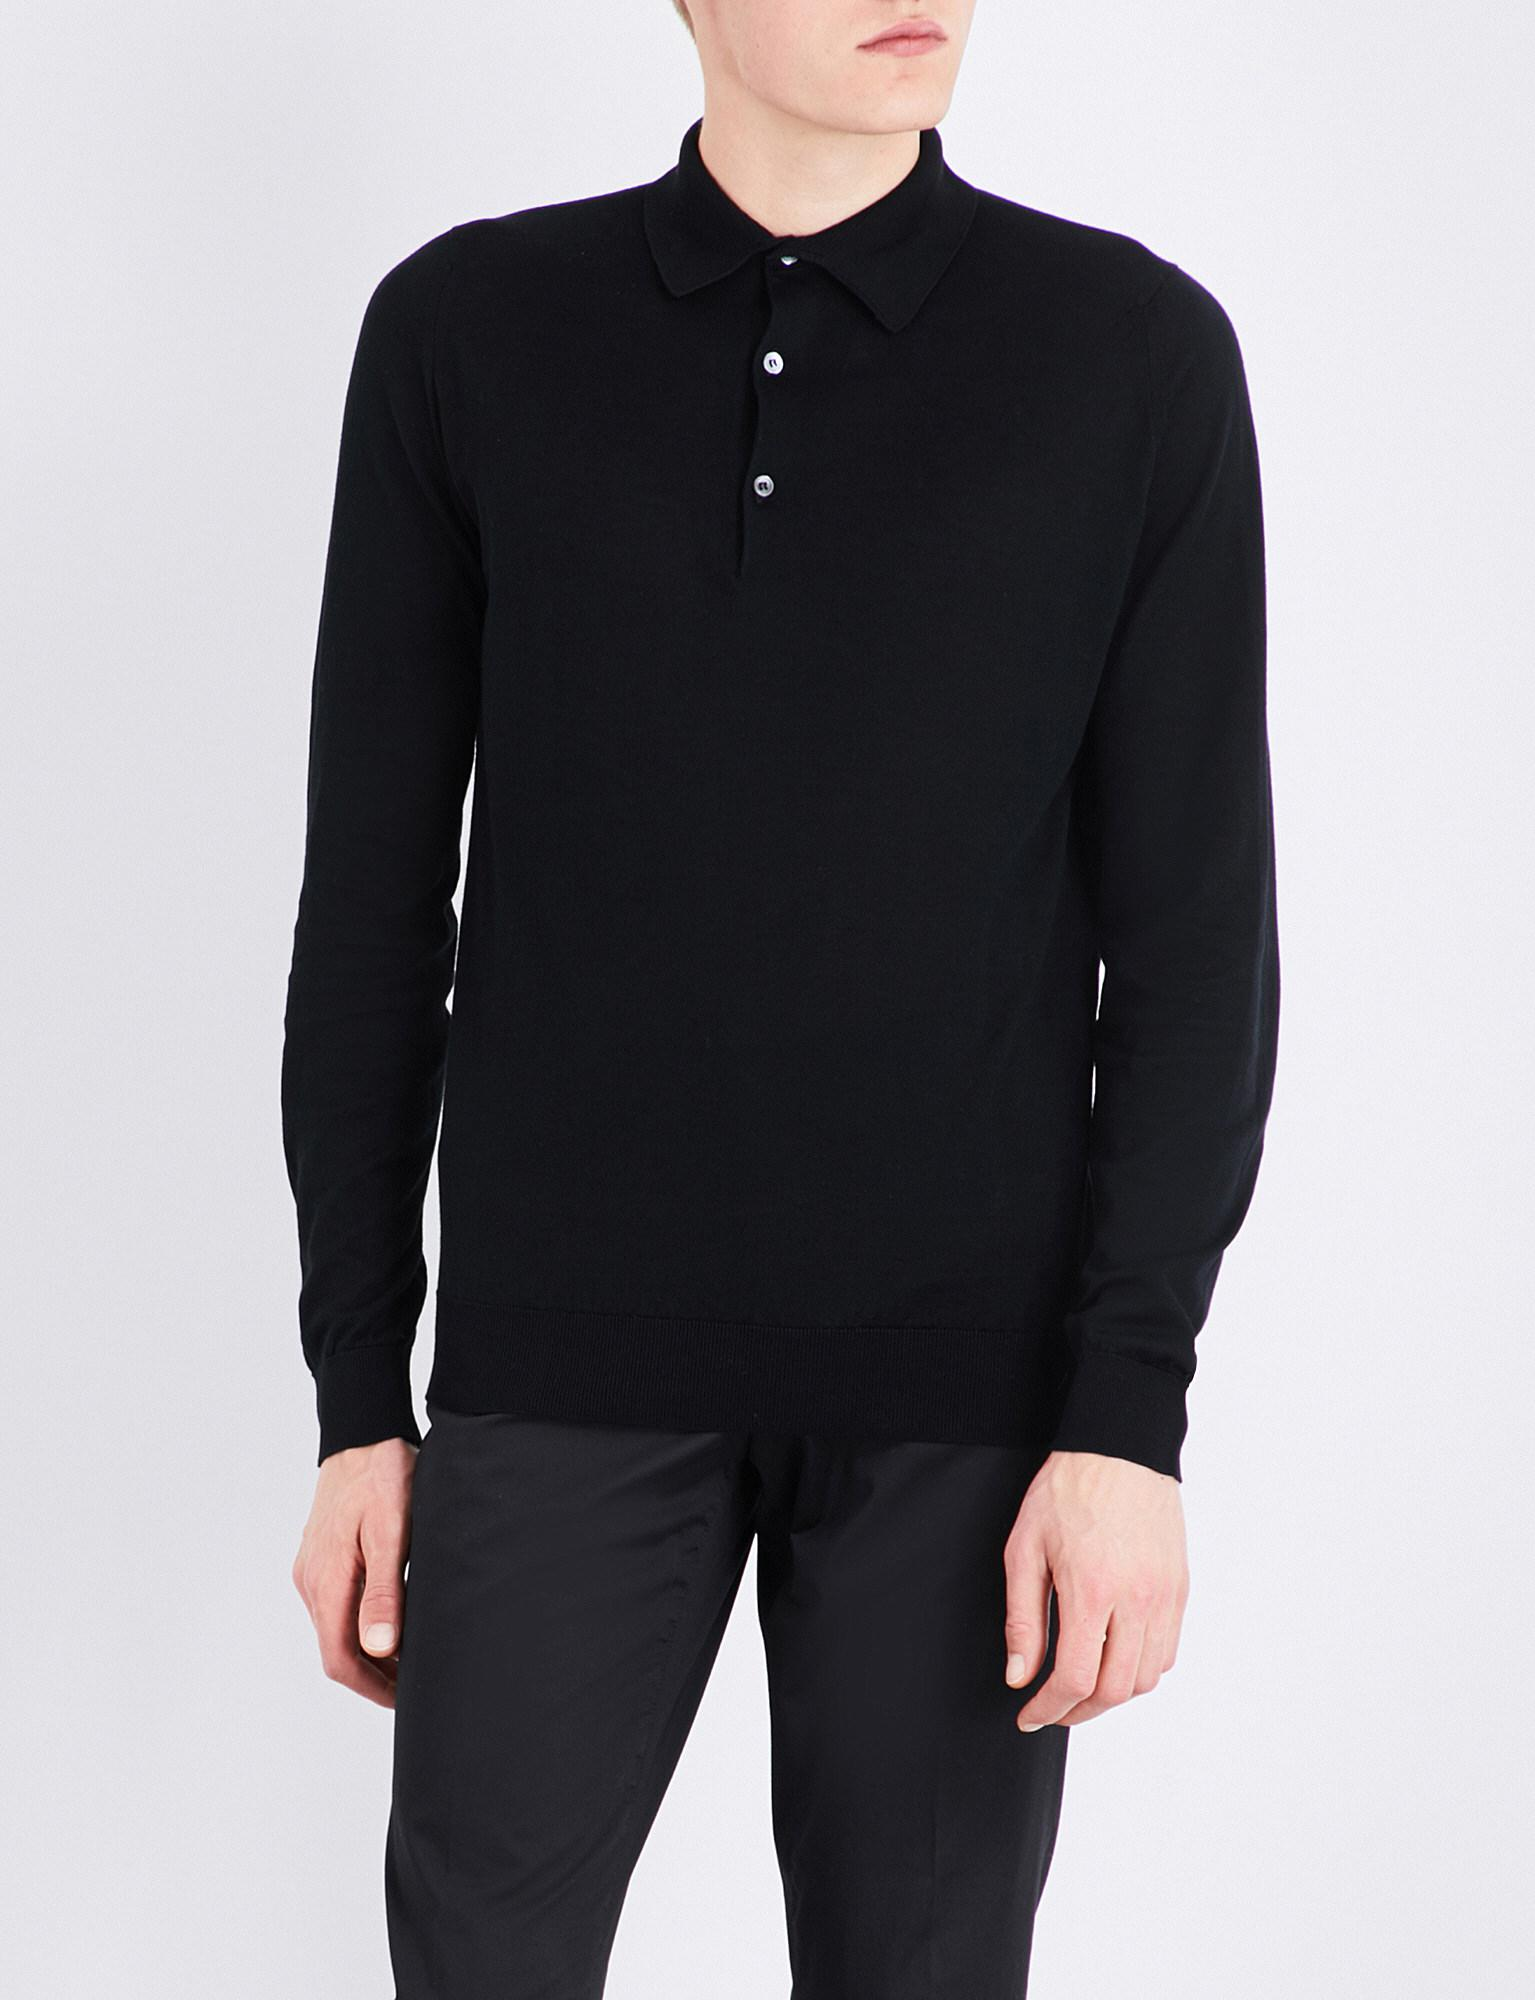 ddeb2d0d Lyst - John Smedley Bradwell Knitted Polo Jumper in Black for Men